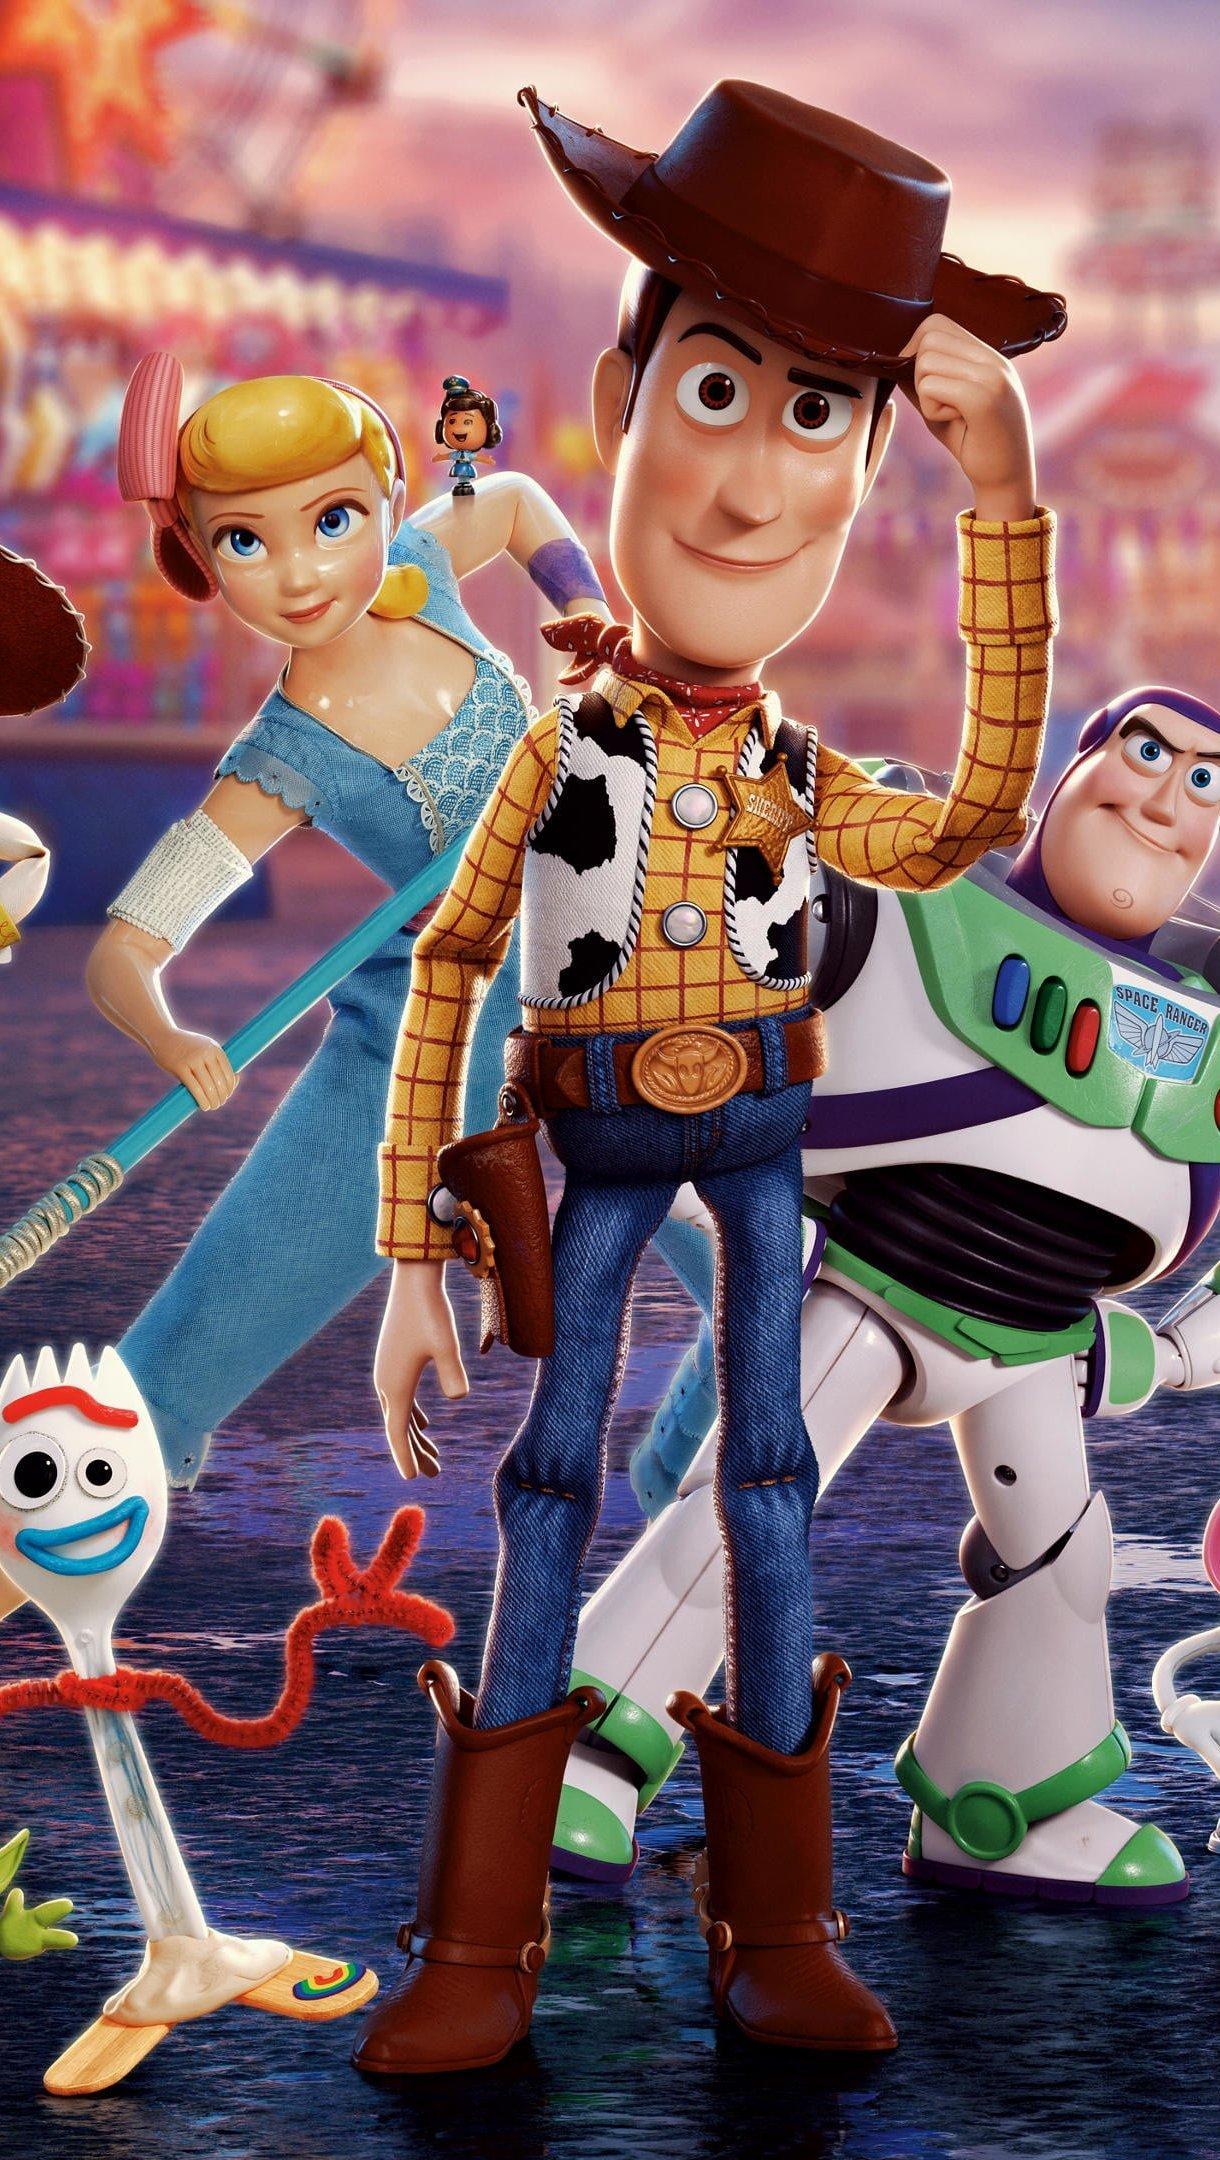 Fondos de pantalla Toy Story 4 Personajes Poster Vertical